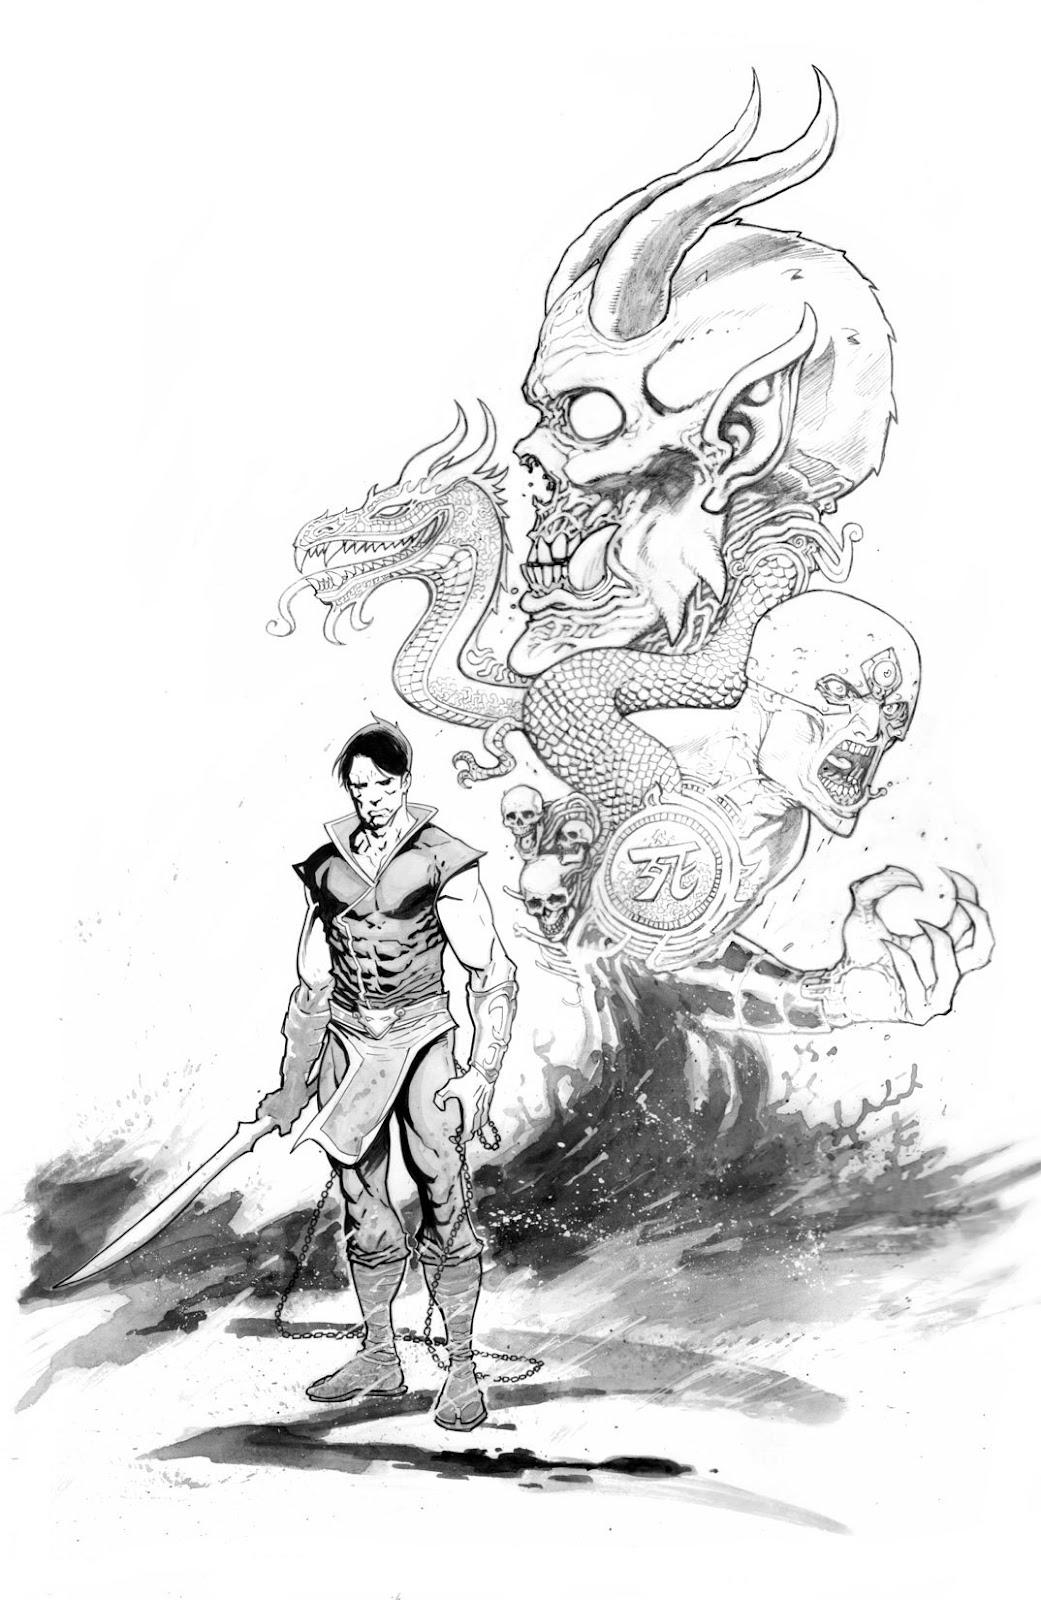 Read online Reaper comic -  Issue #2 - 42